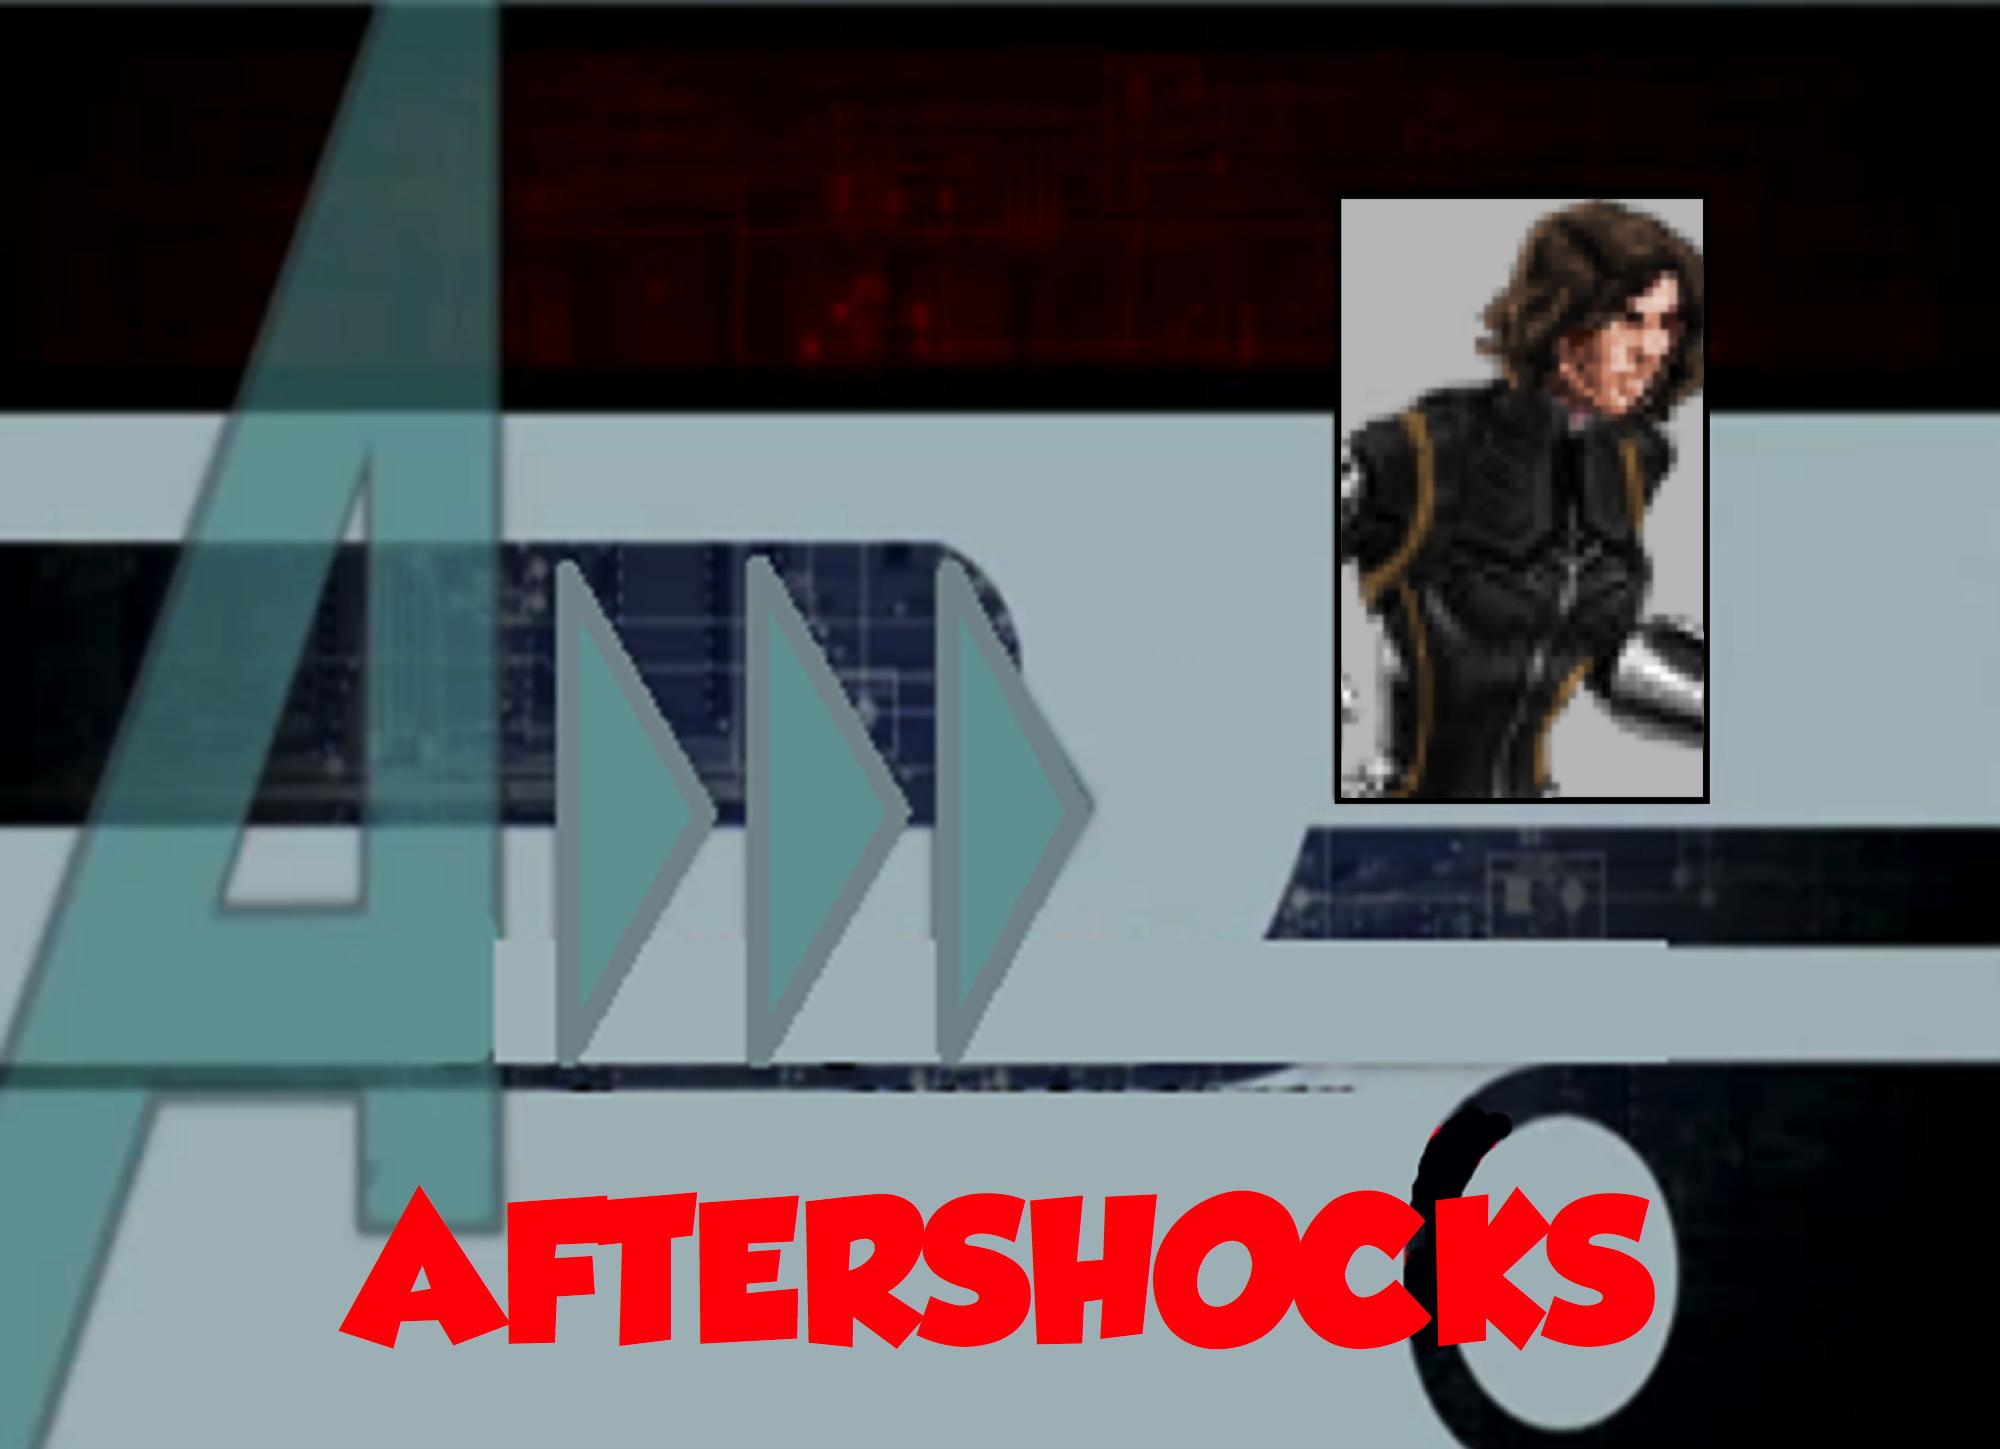 Aftershocks (A!)